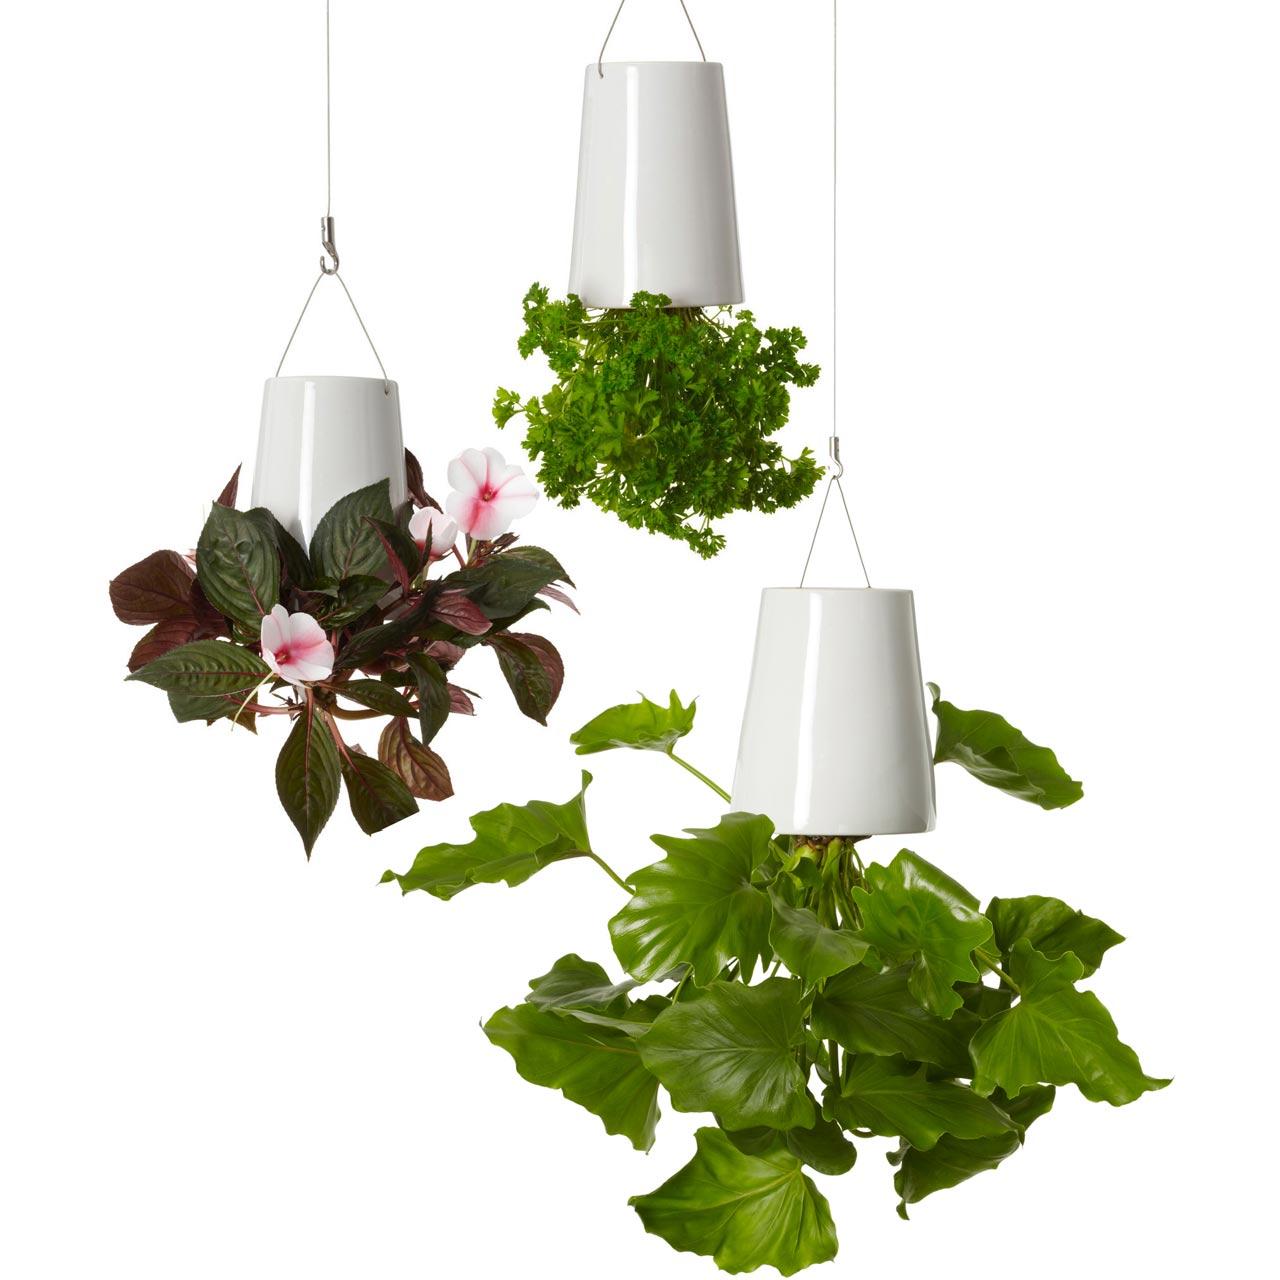 BOSKKE Sky Planter Ceramic | The Design Gift Shop